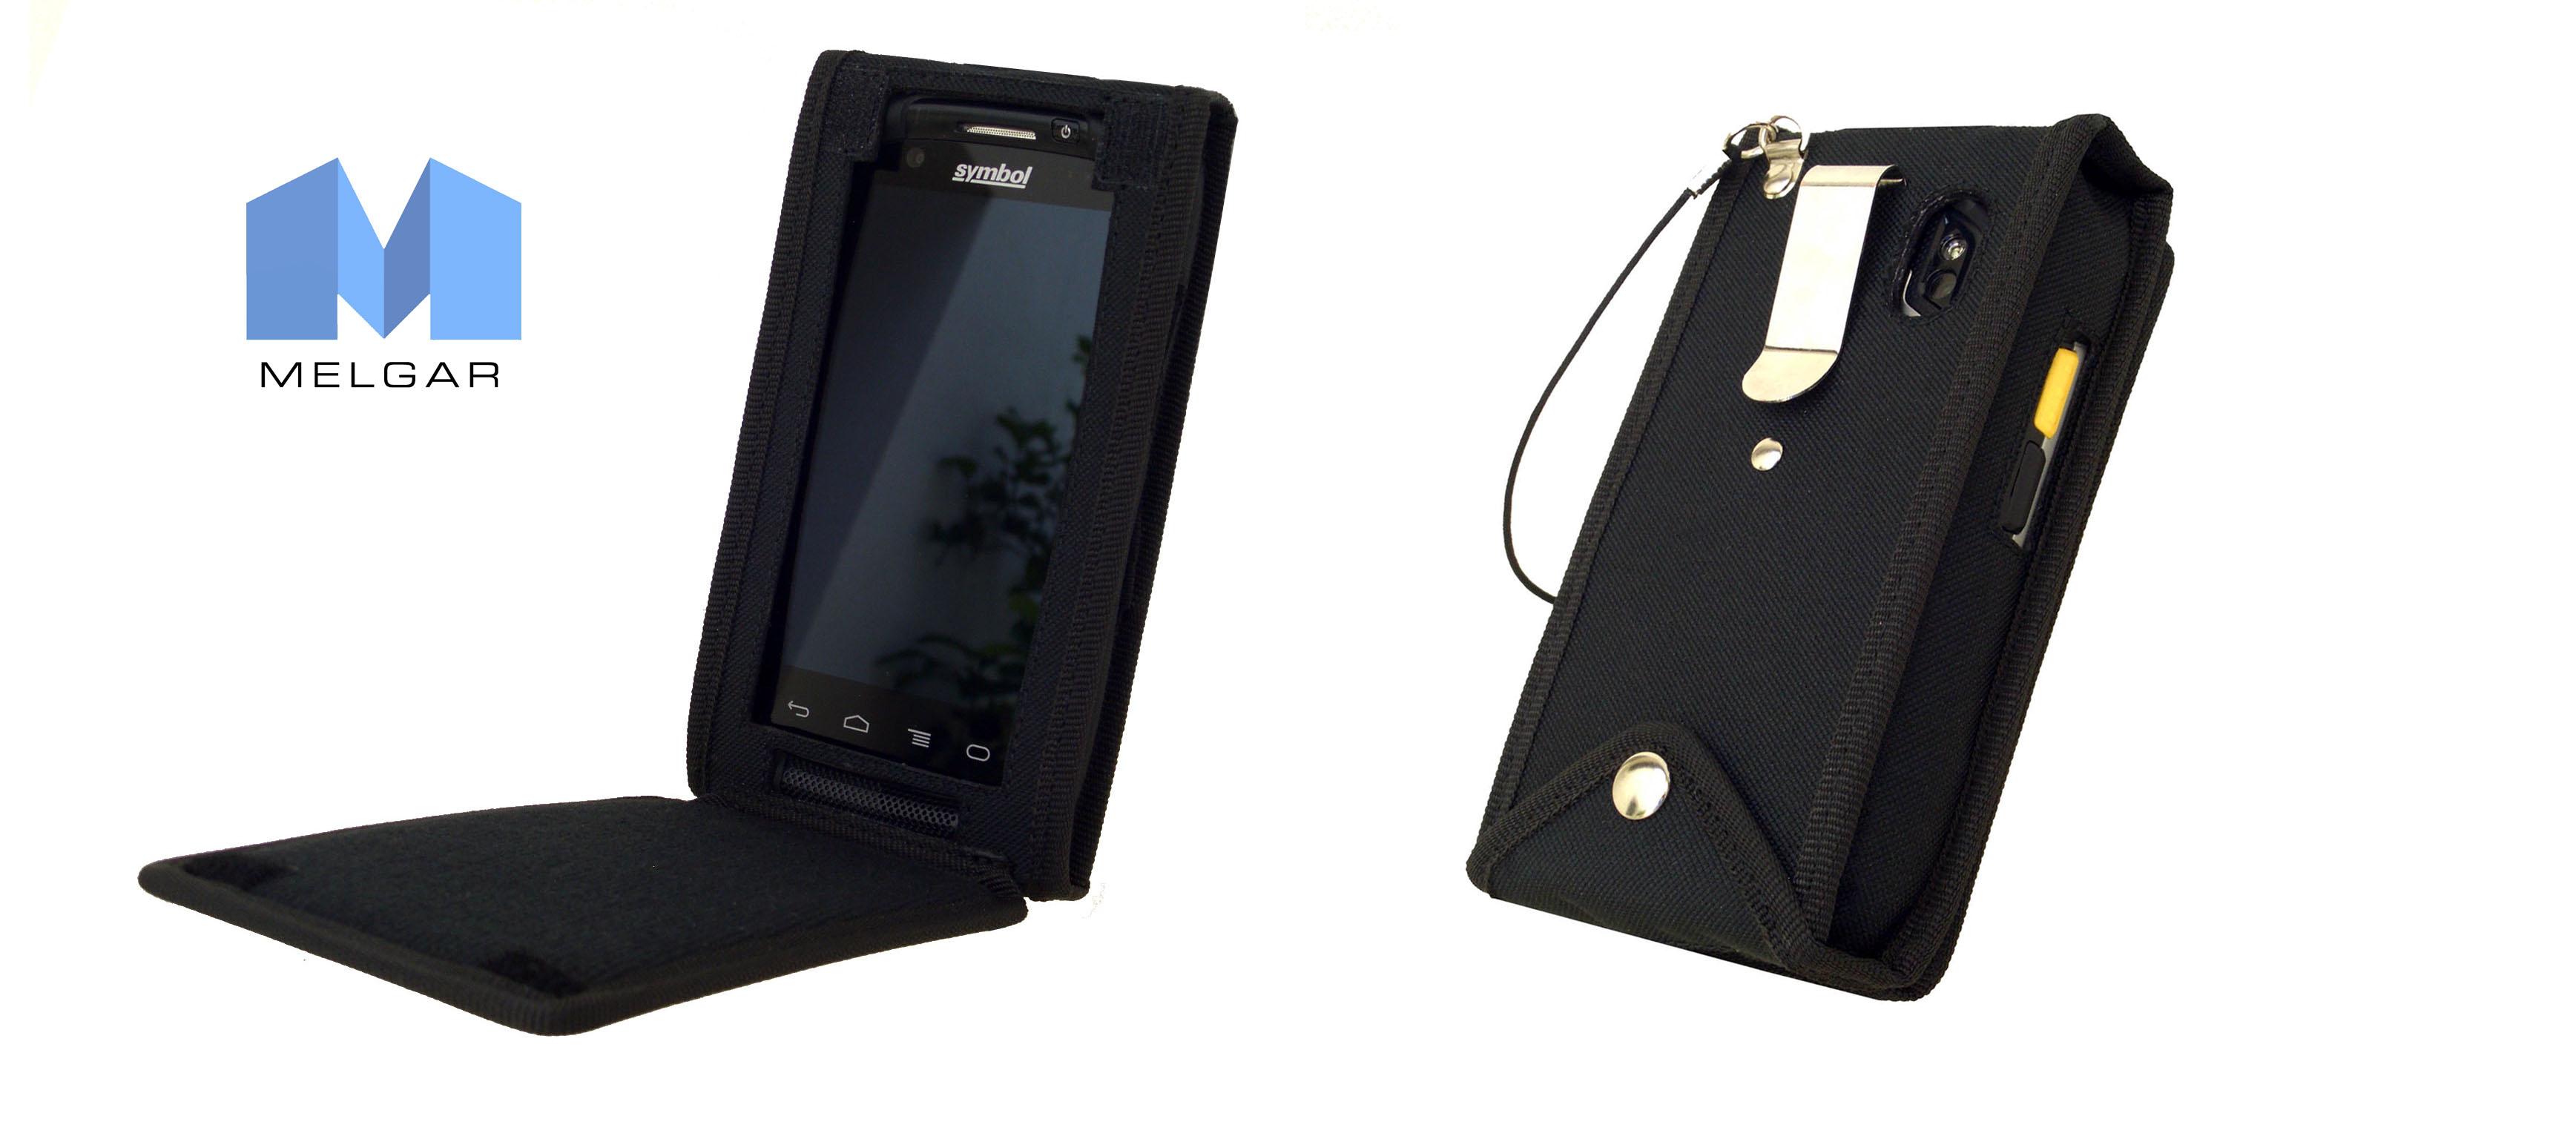 Zebra tc70 tc75 case Melgar for handheld computer Zebra brand